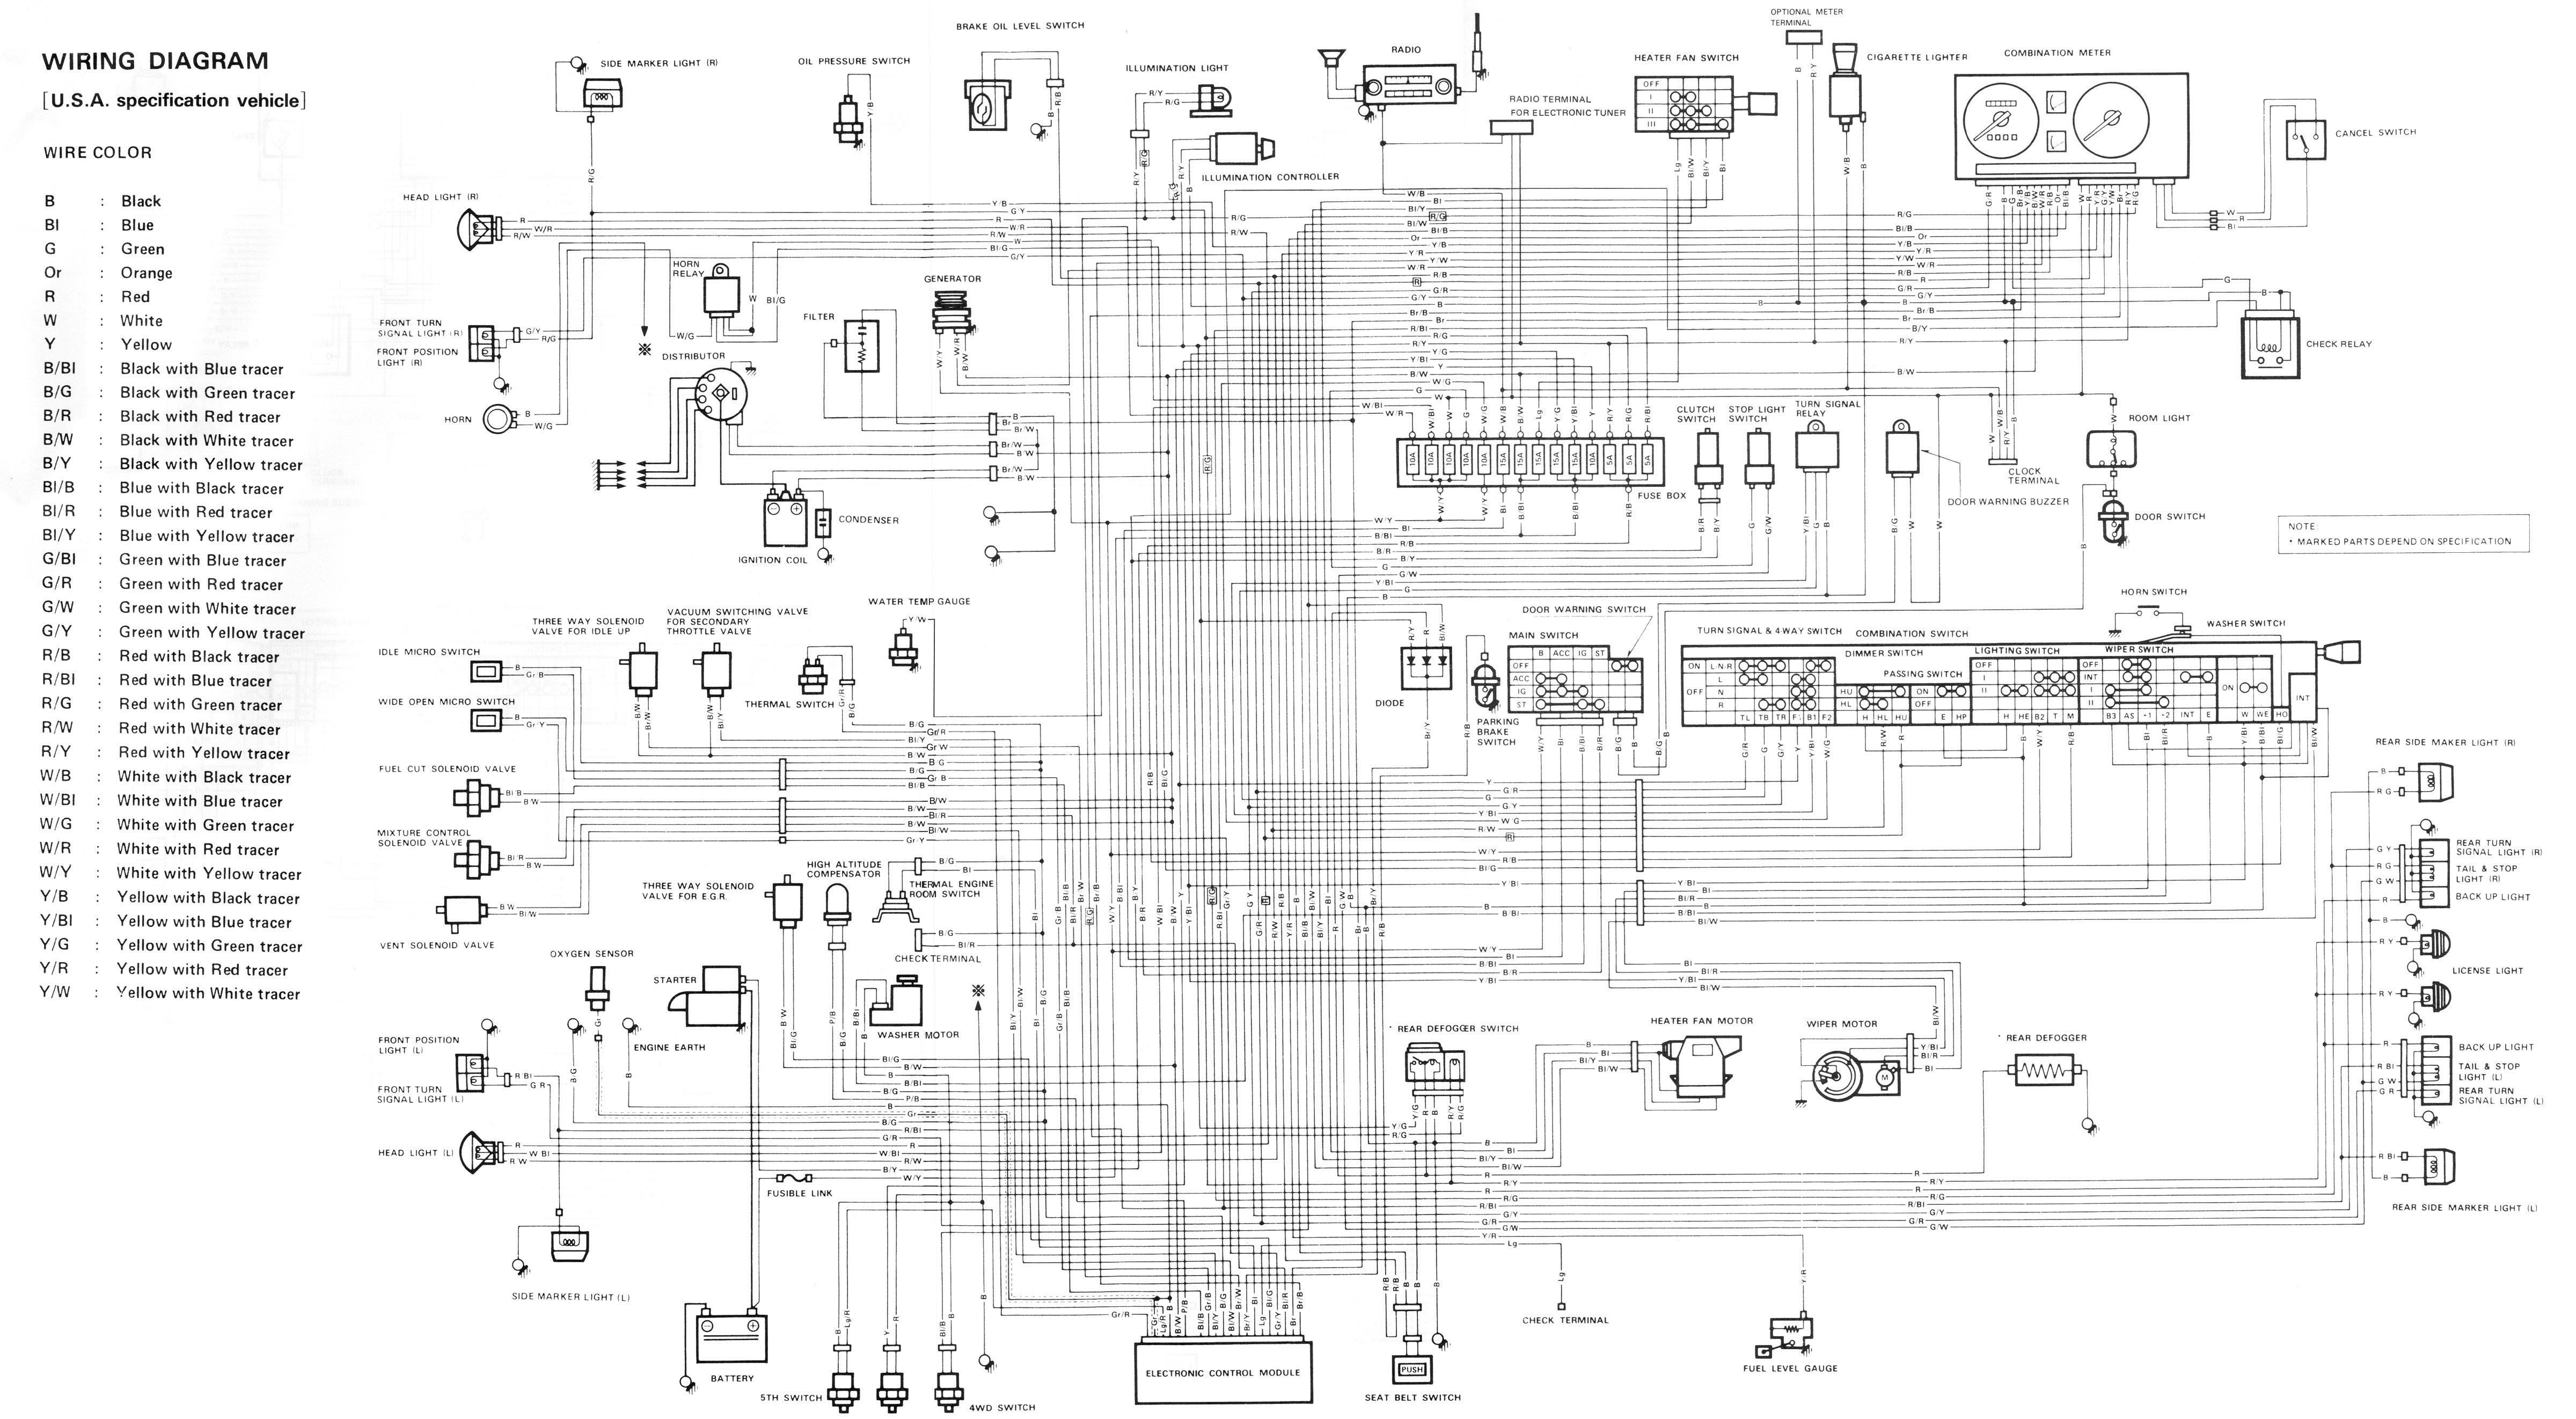 Suzuki manuales